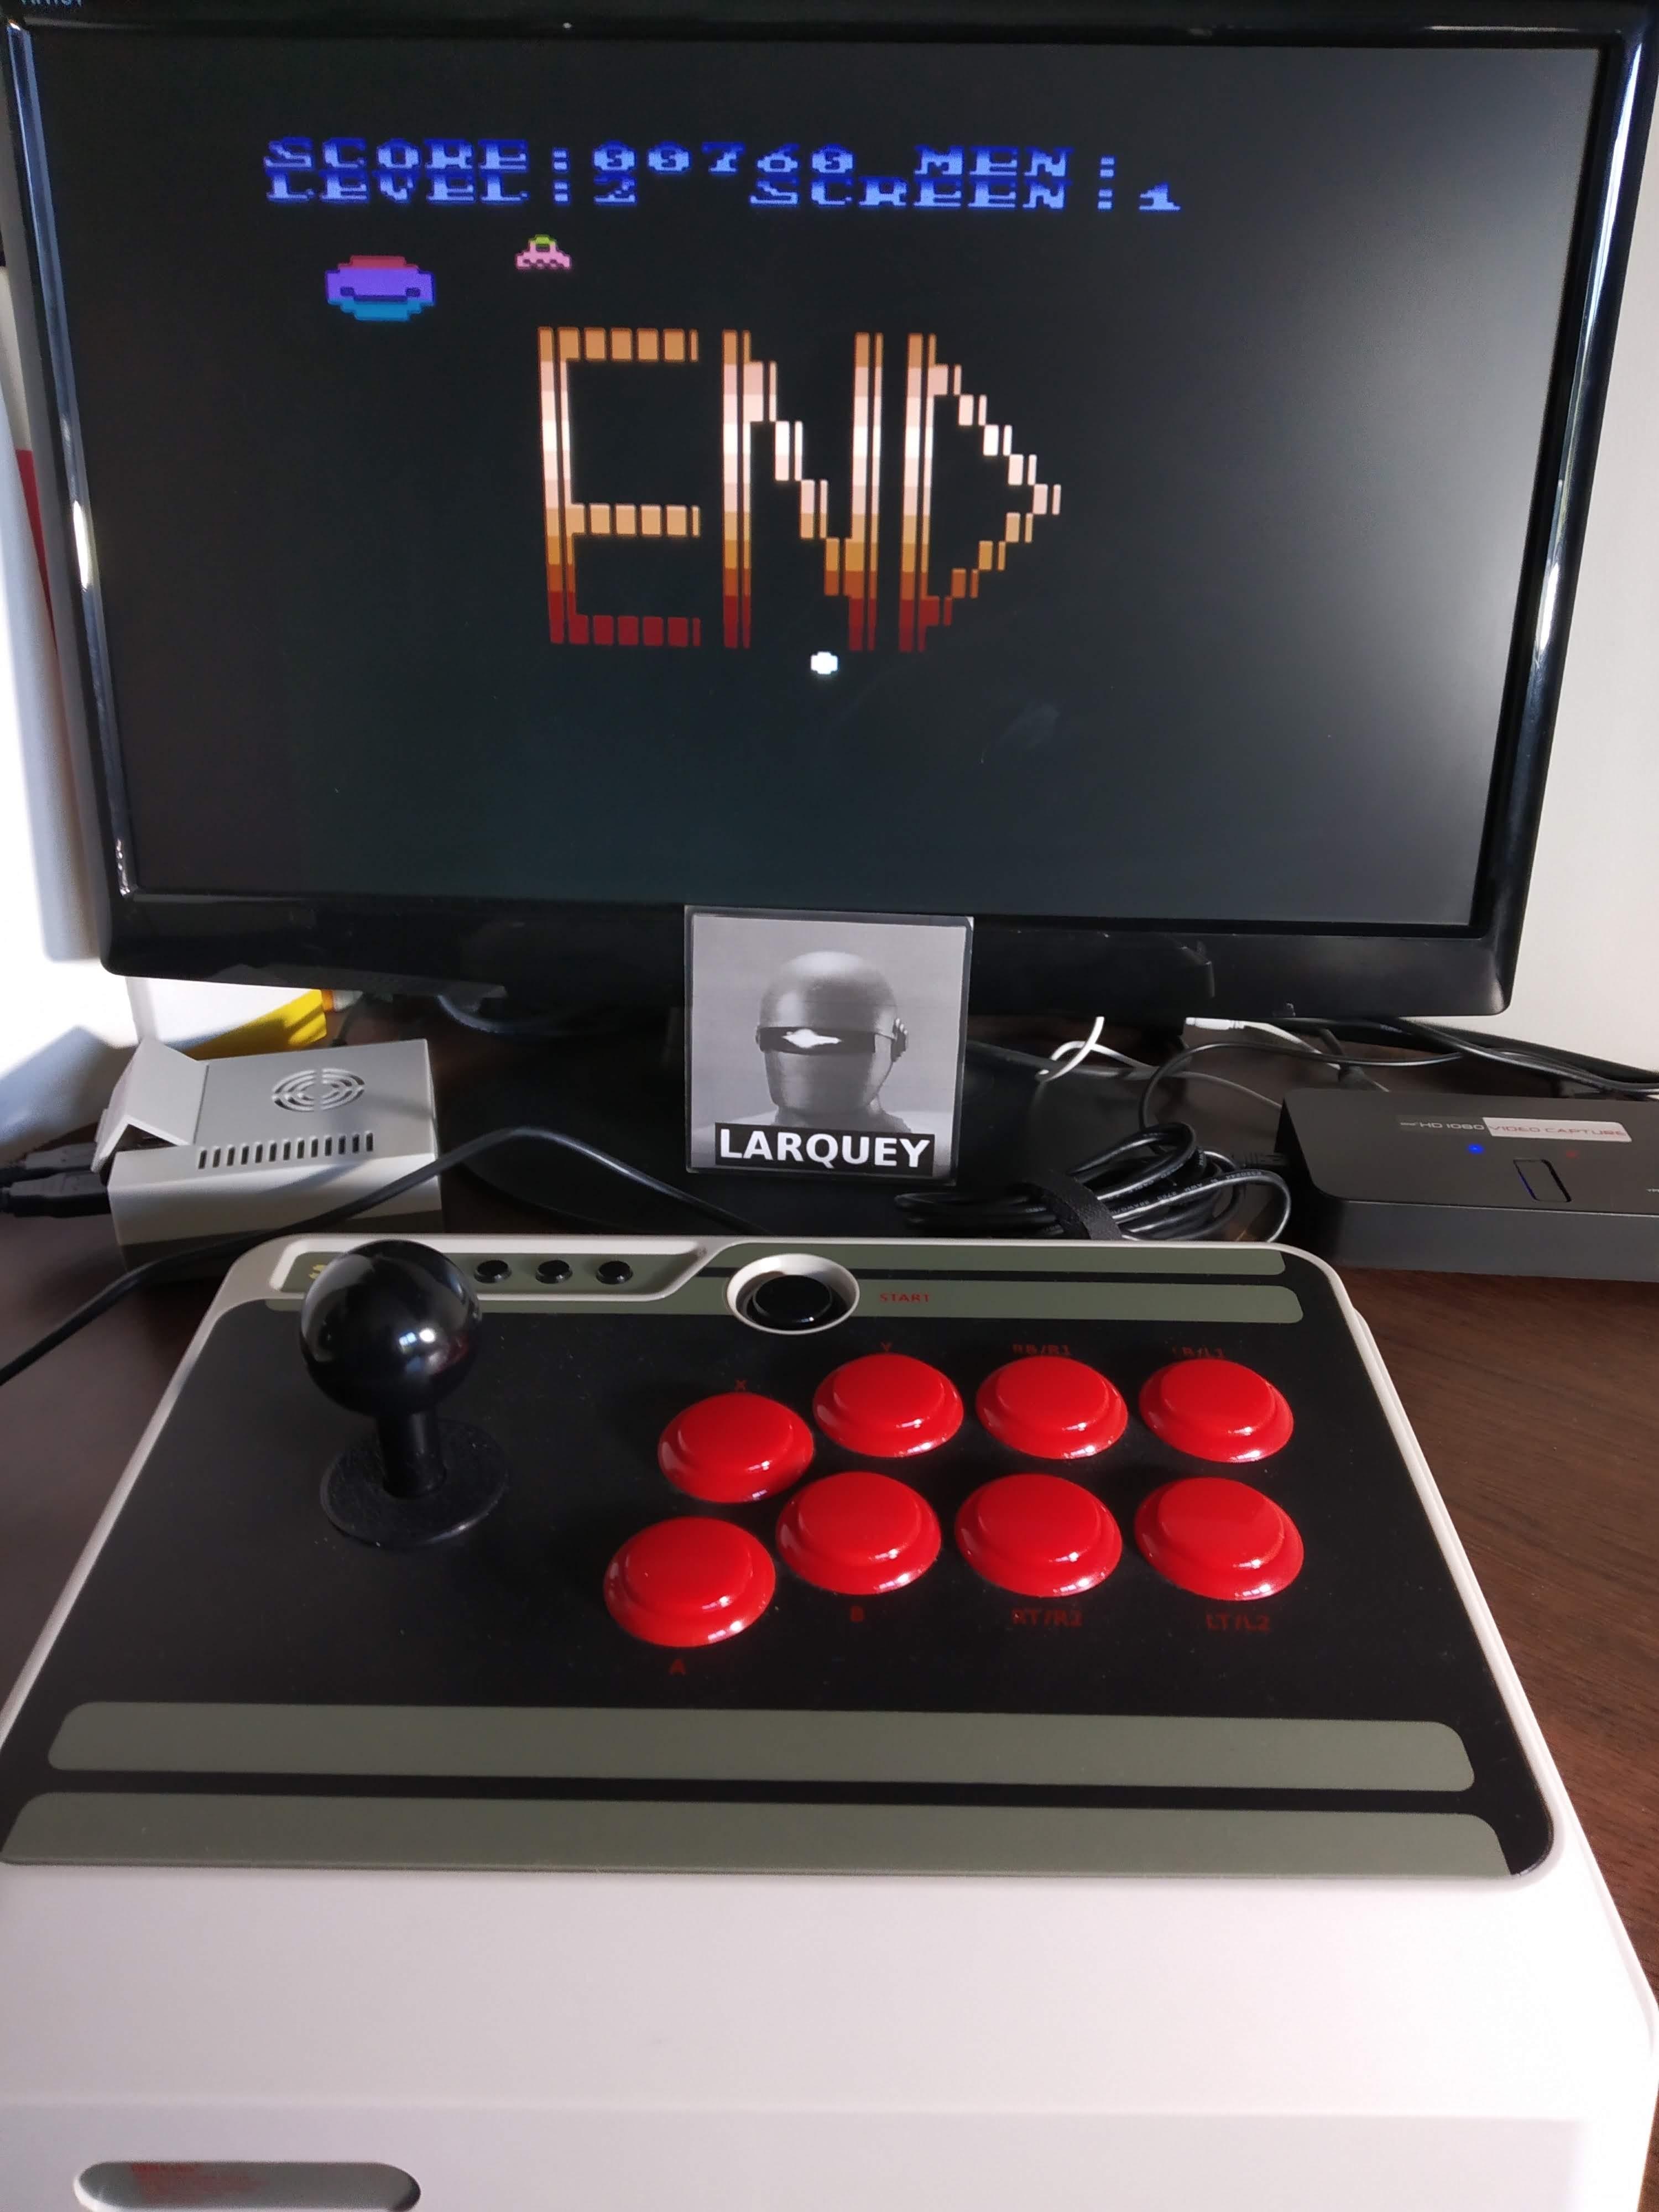 Larquey: Ataroid (Atari 400/800/XL/XE Emulated) 760 points on 2019-11-24 12:52:54